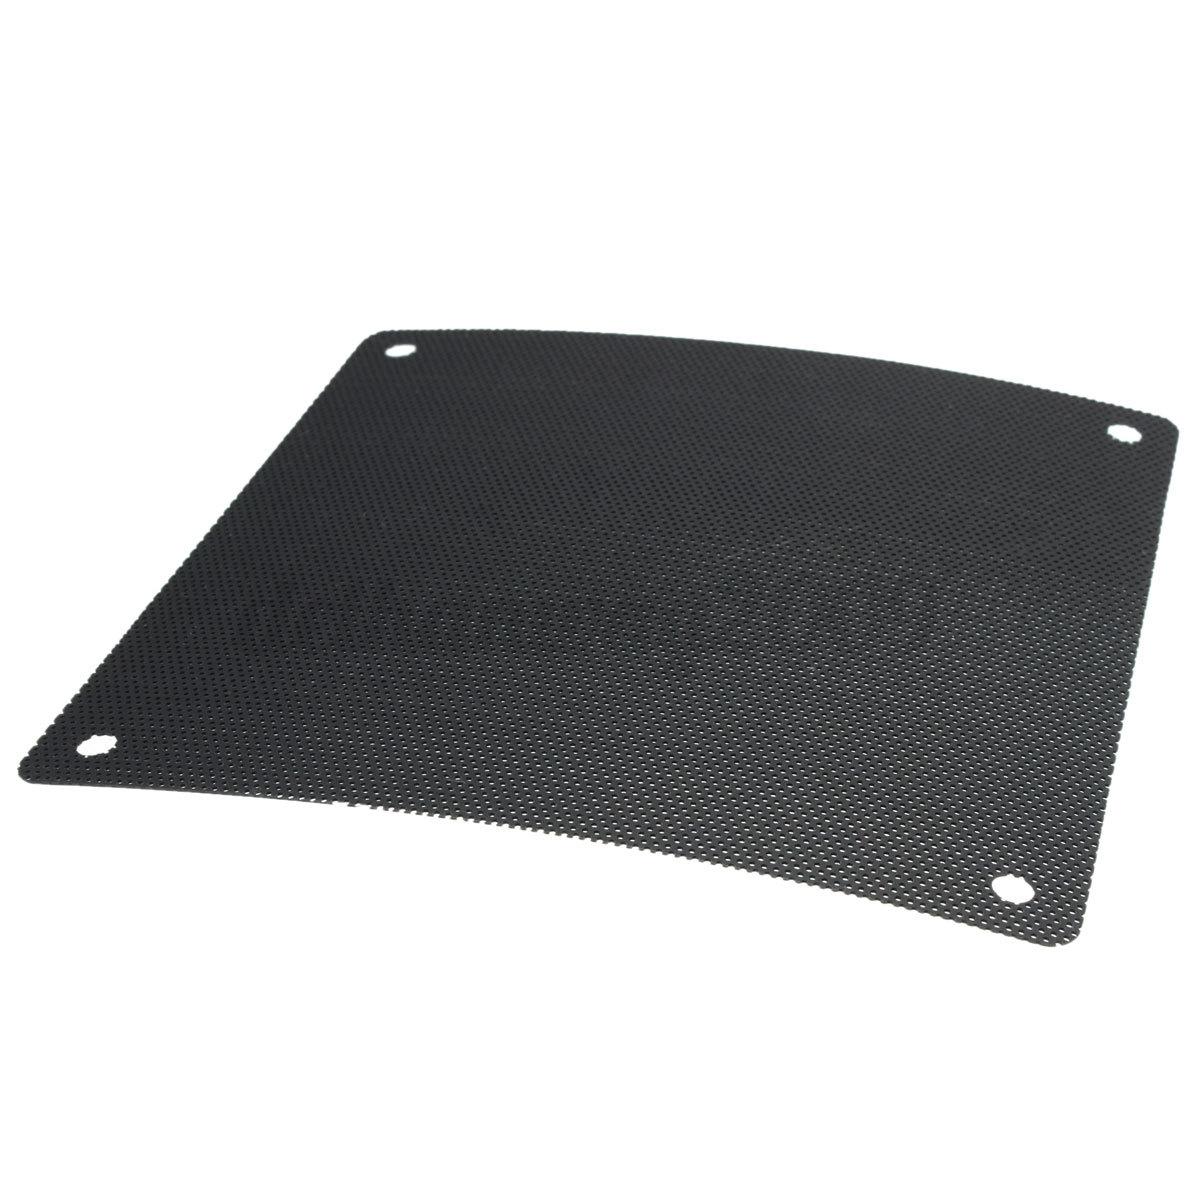 2pcs cuttable pvc pc fan dust air filter dustproof computer case mesh 120x120mm ebay. Black Bedroom Furniture Sets. Home Design Ideas